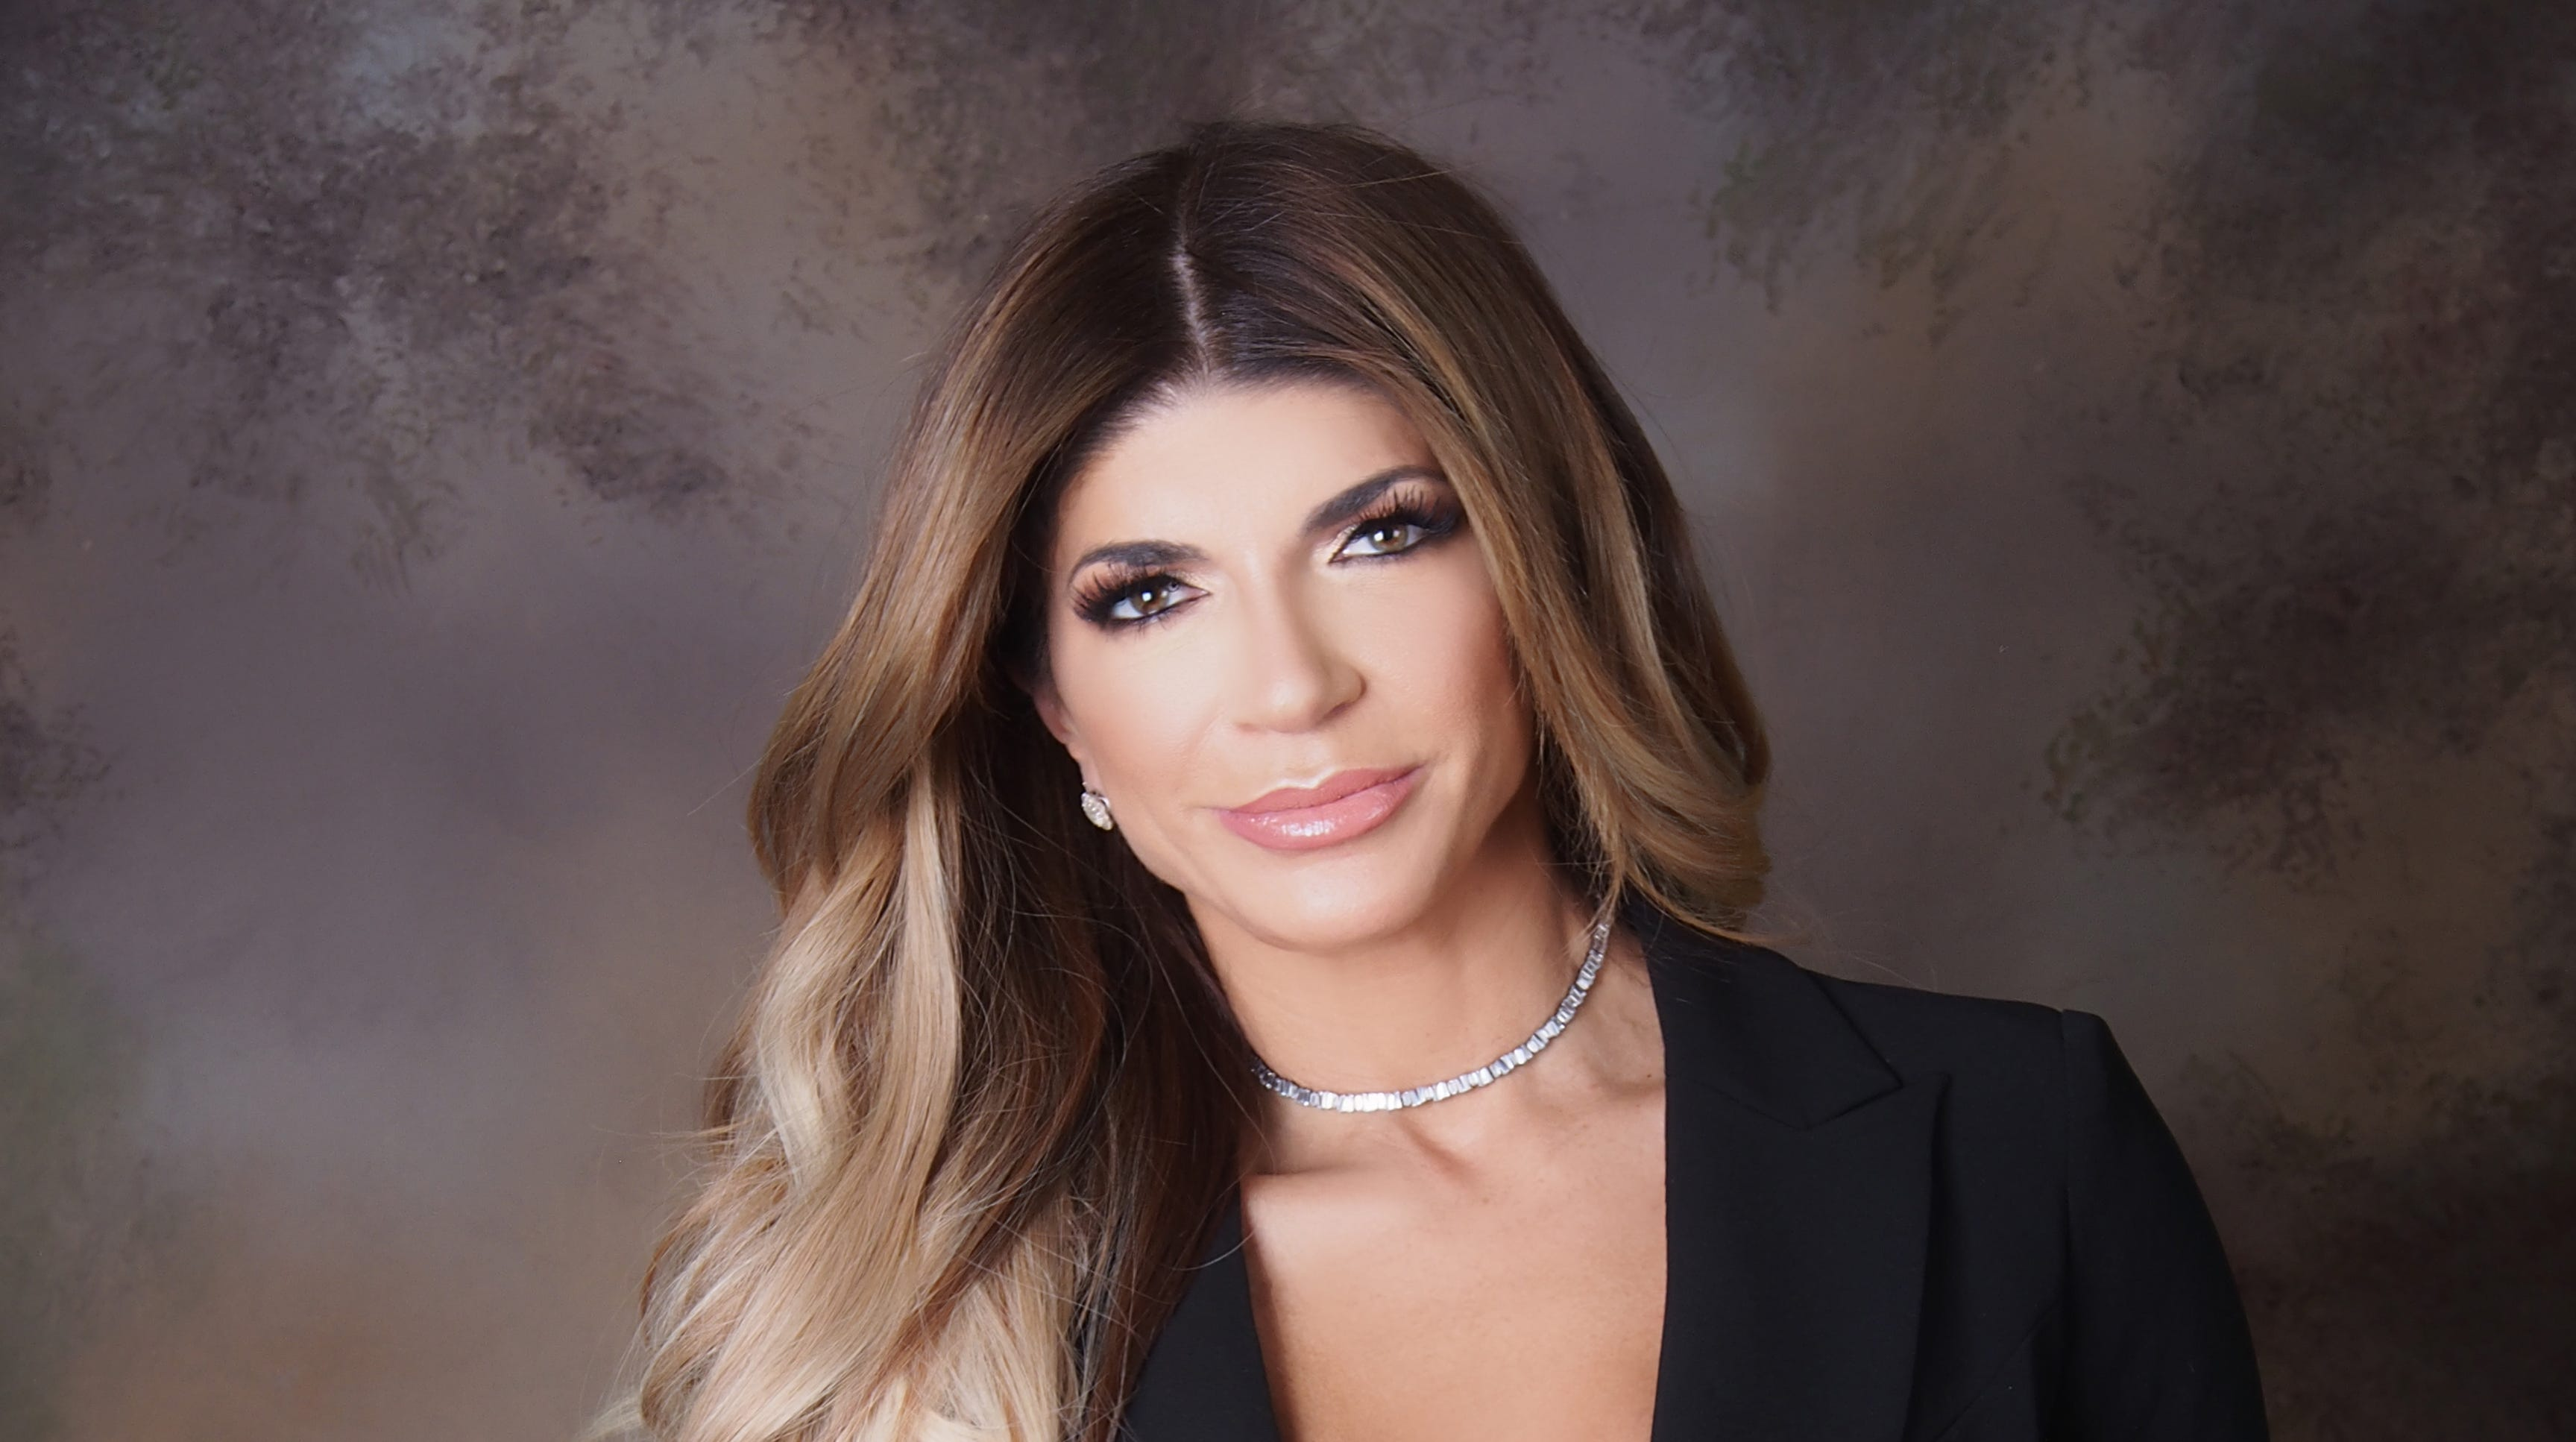 RHONJ: Teresa Giudice and other housewives give back